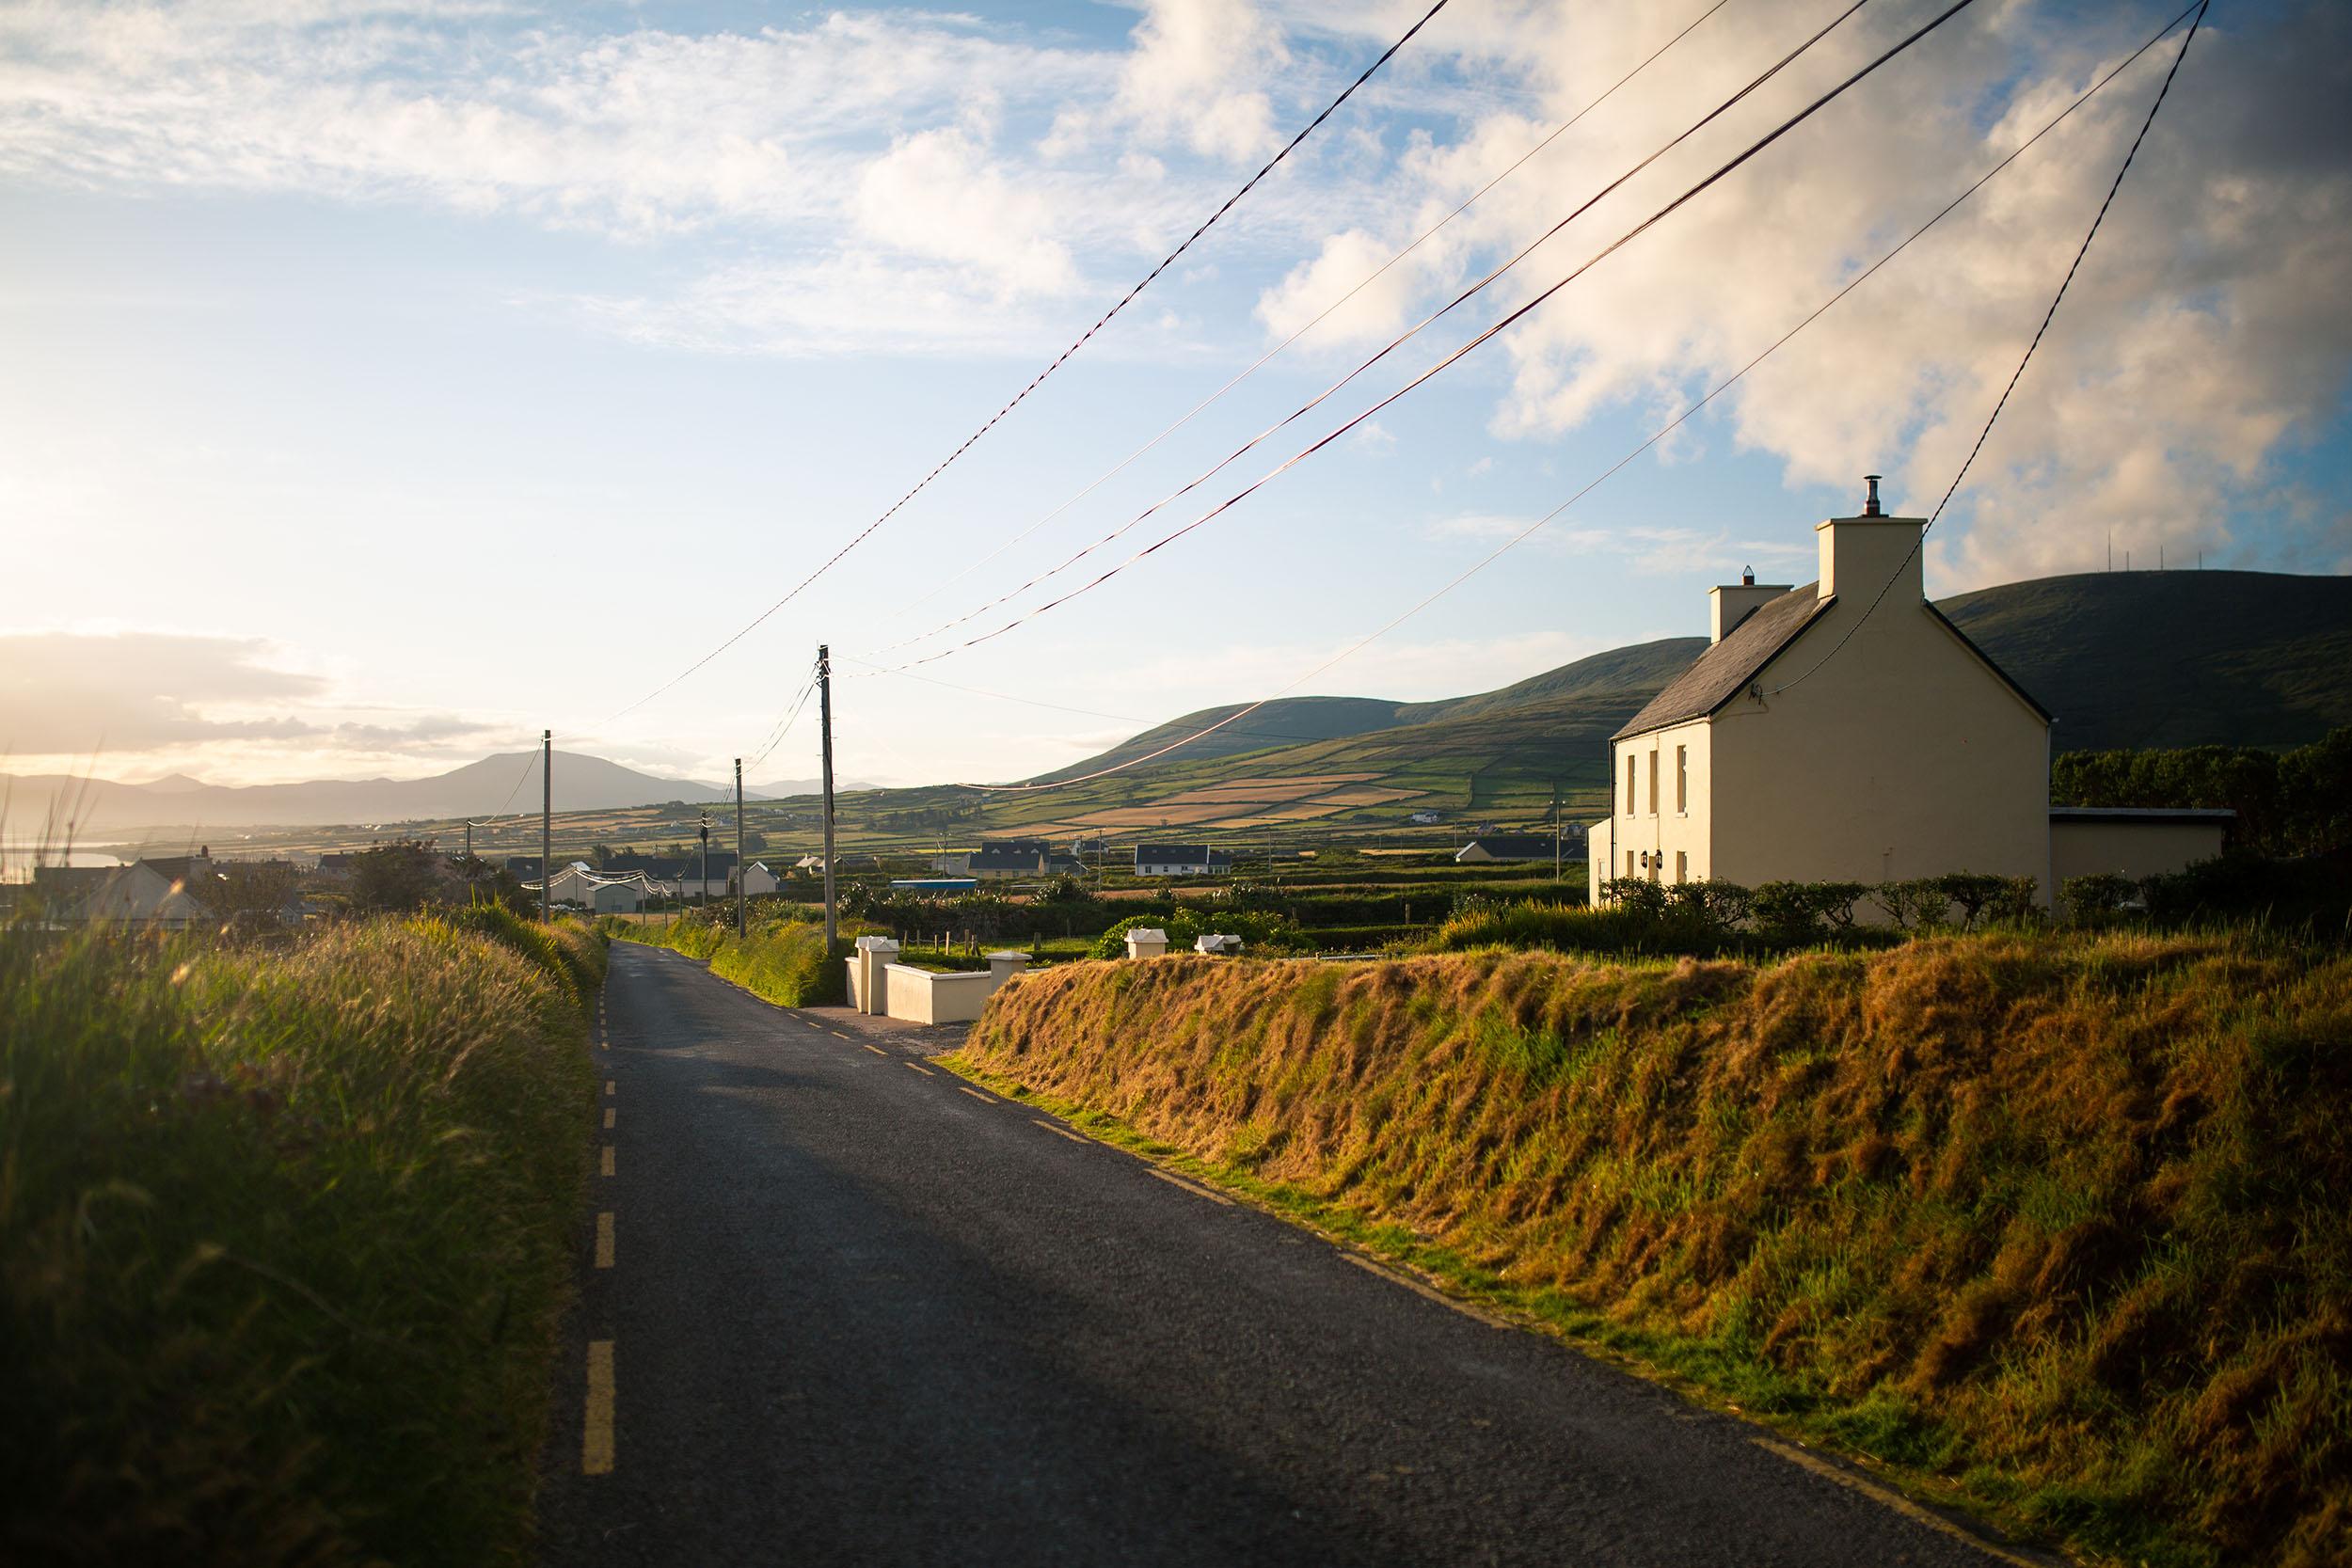 IRELAND_KERRY_PORTMAGEE_0022